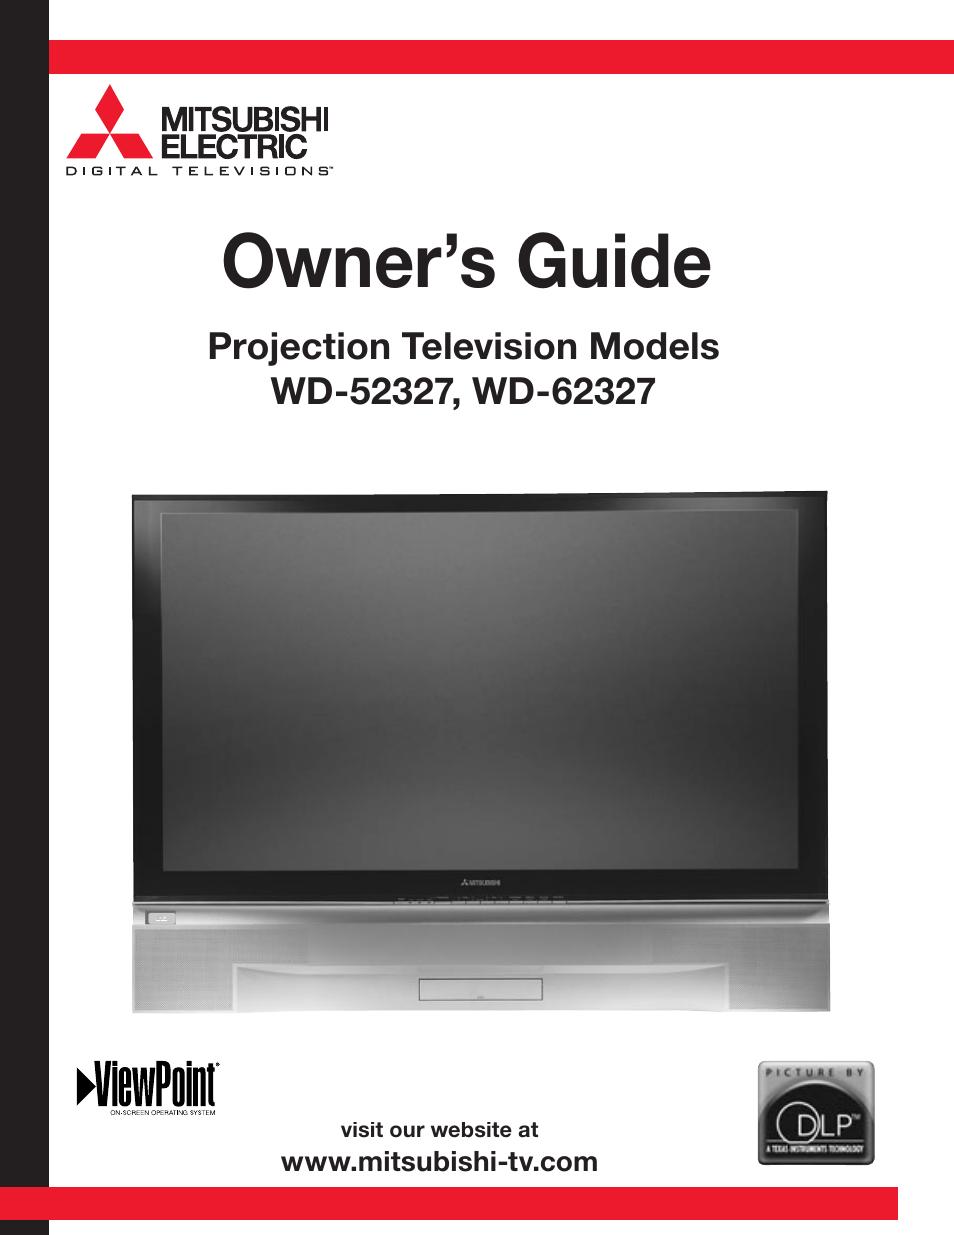 mitsubishi tv owner manual product user guide instruction u2022 rh testdpc co manual mitsubishi colt 2007 manual mitsubishi colt 2007